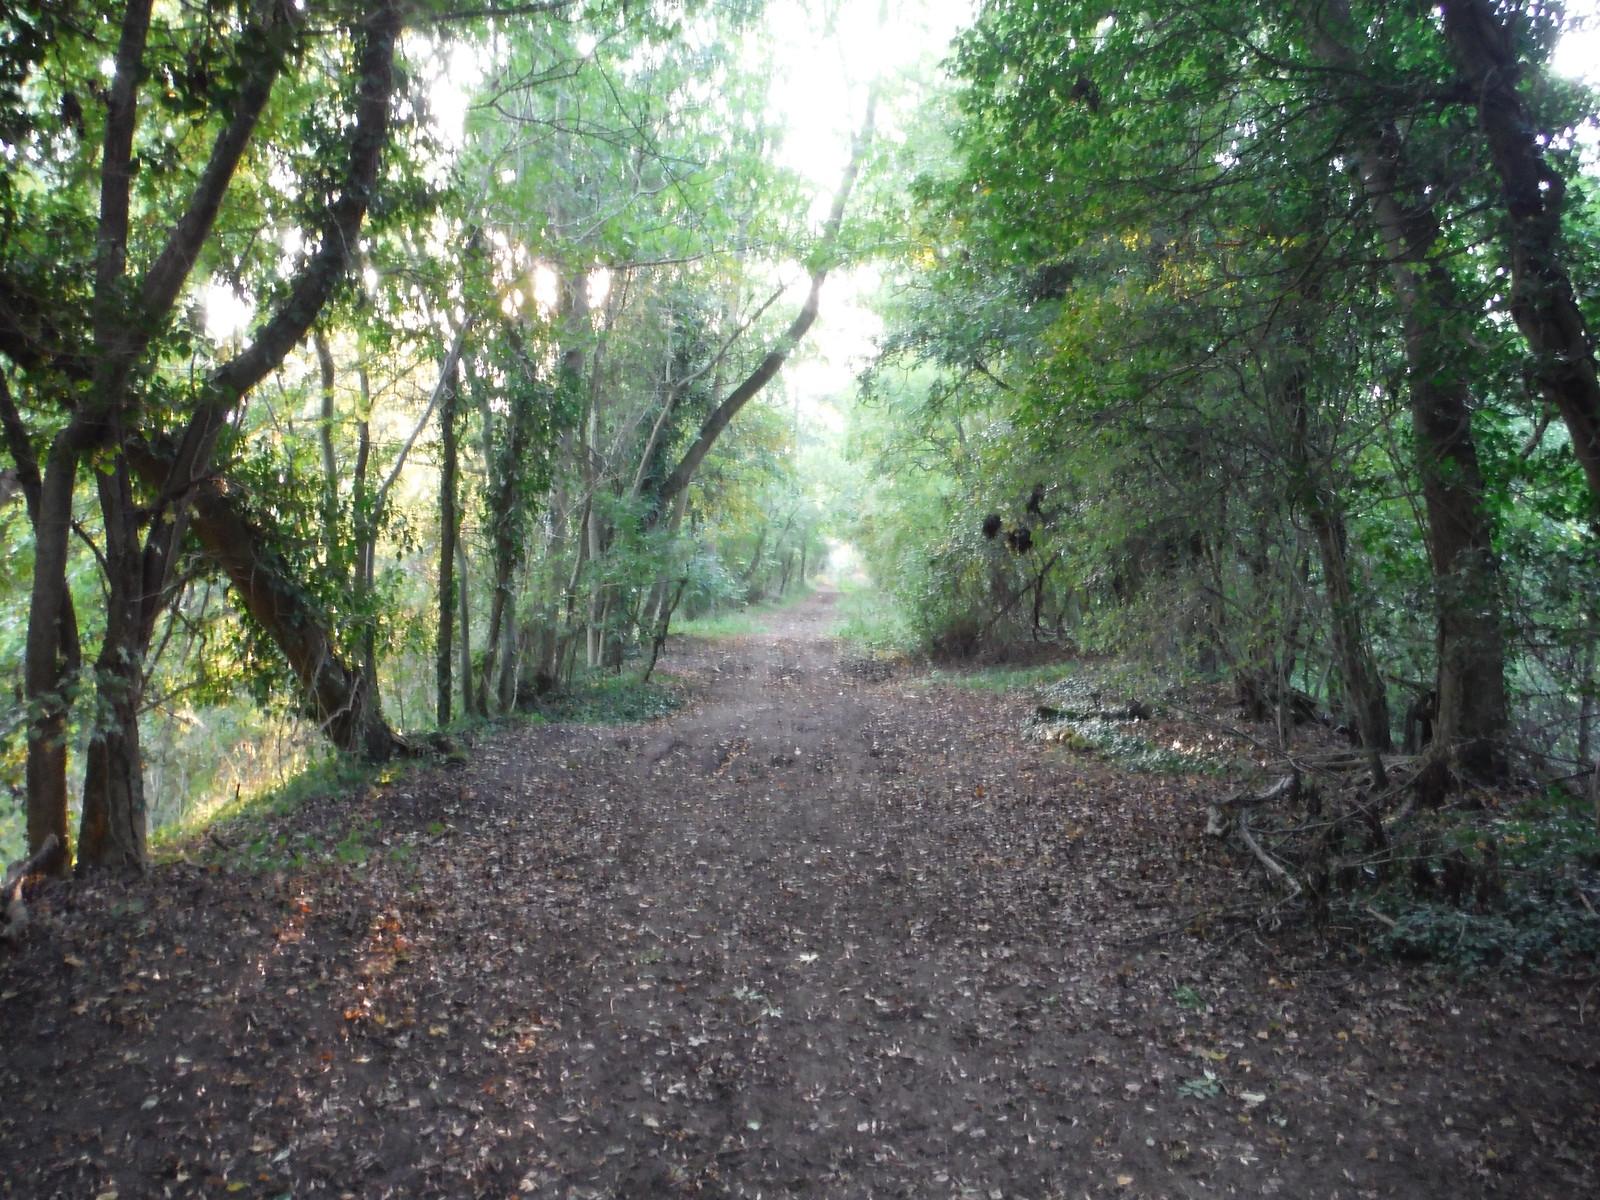 Dismantled Railway Line, Maldon to South Woodham Ferrers SWC Walk 159 South Woodham Ferrers to North Fambridge